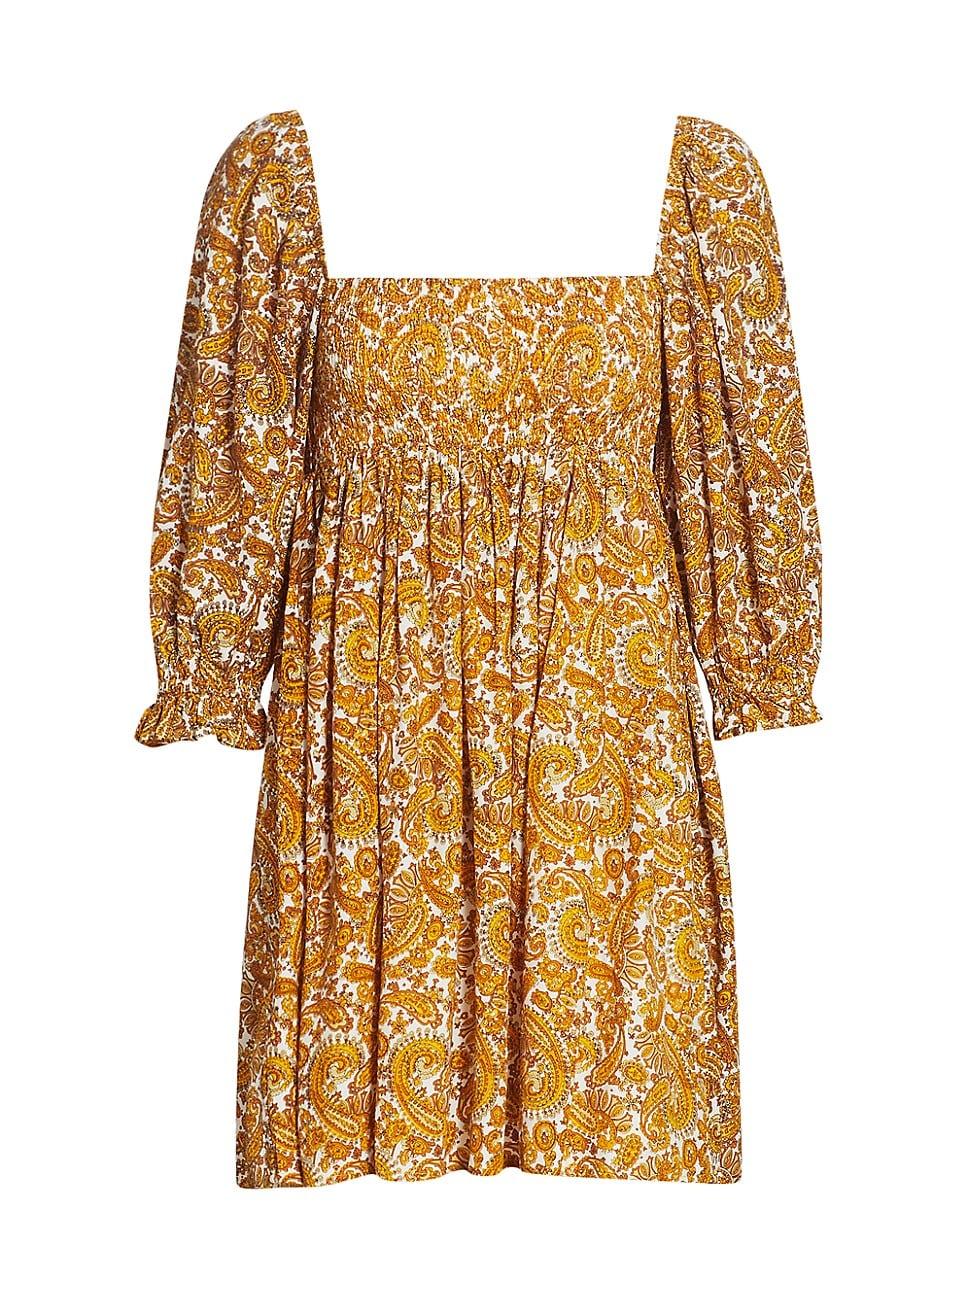 Faithfull The Brand WOMEN'S ALINA MINI DRESS